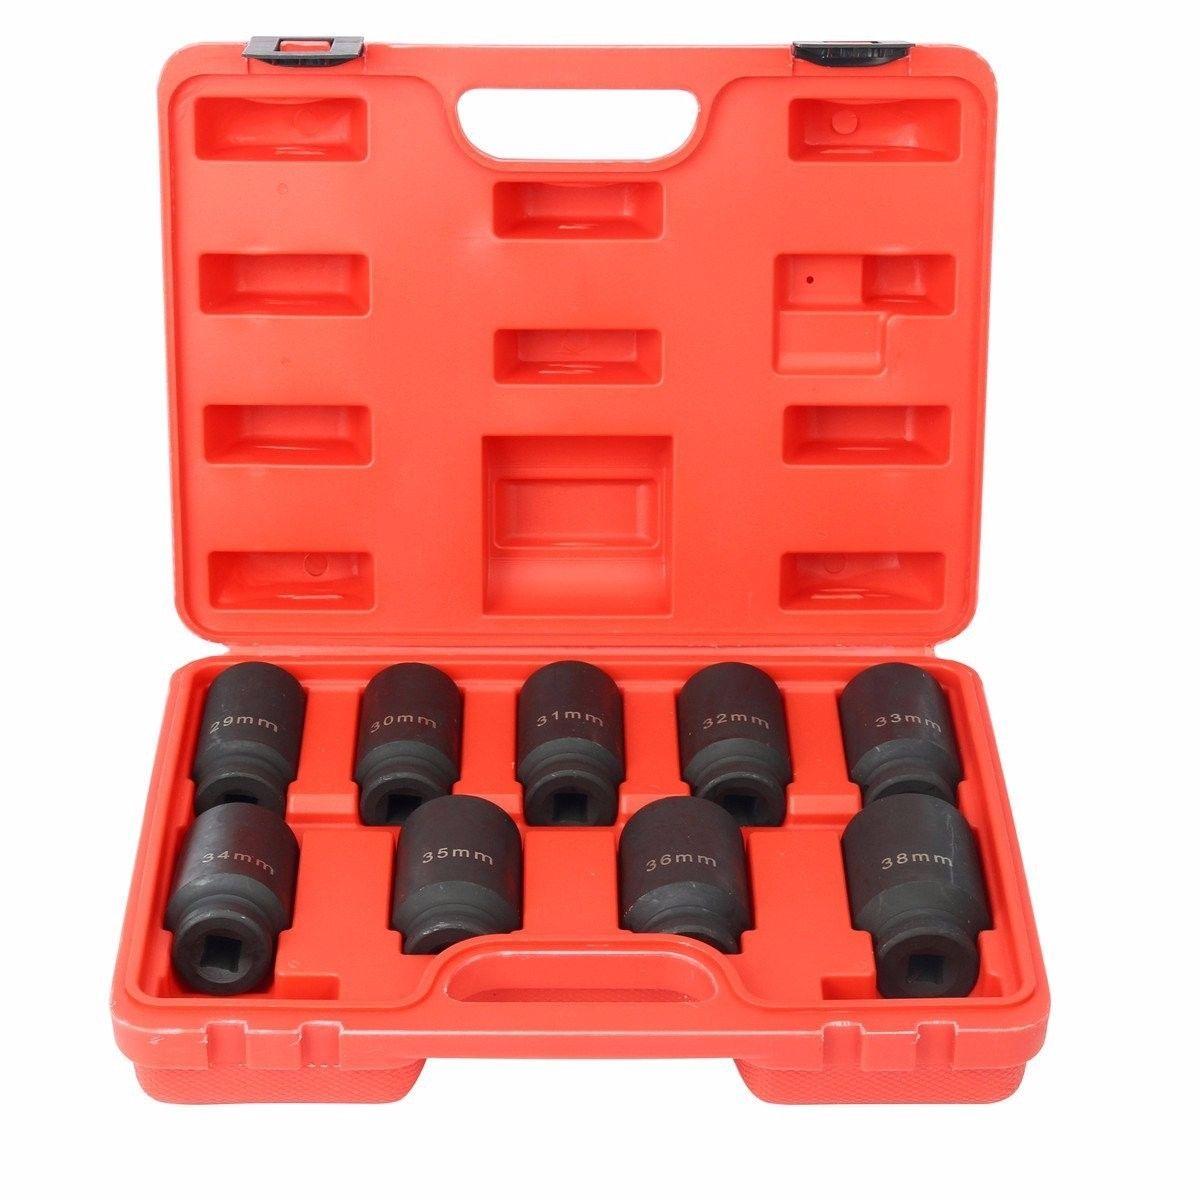 9pc 1/2 Drive Deep Impact Axle Hub Nut Socket Set 29-30-31-32-33-34-35-36-&38mm9pc 1/2 Drive Deep Impact Axle Hub Nut Socket Set 29-30-31-32-33-34-35-36-&38mm